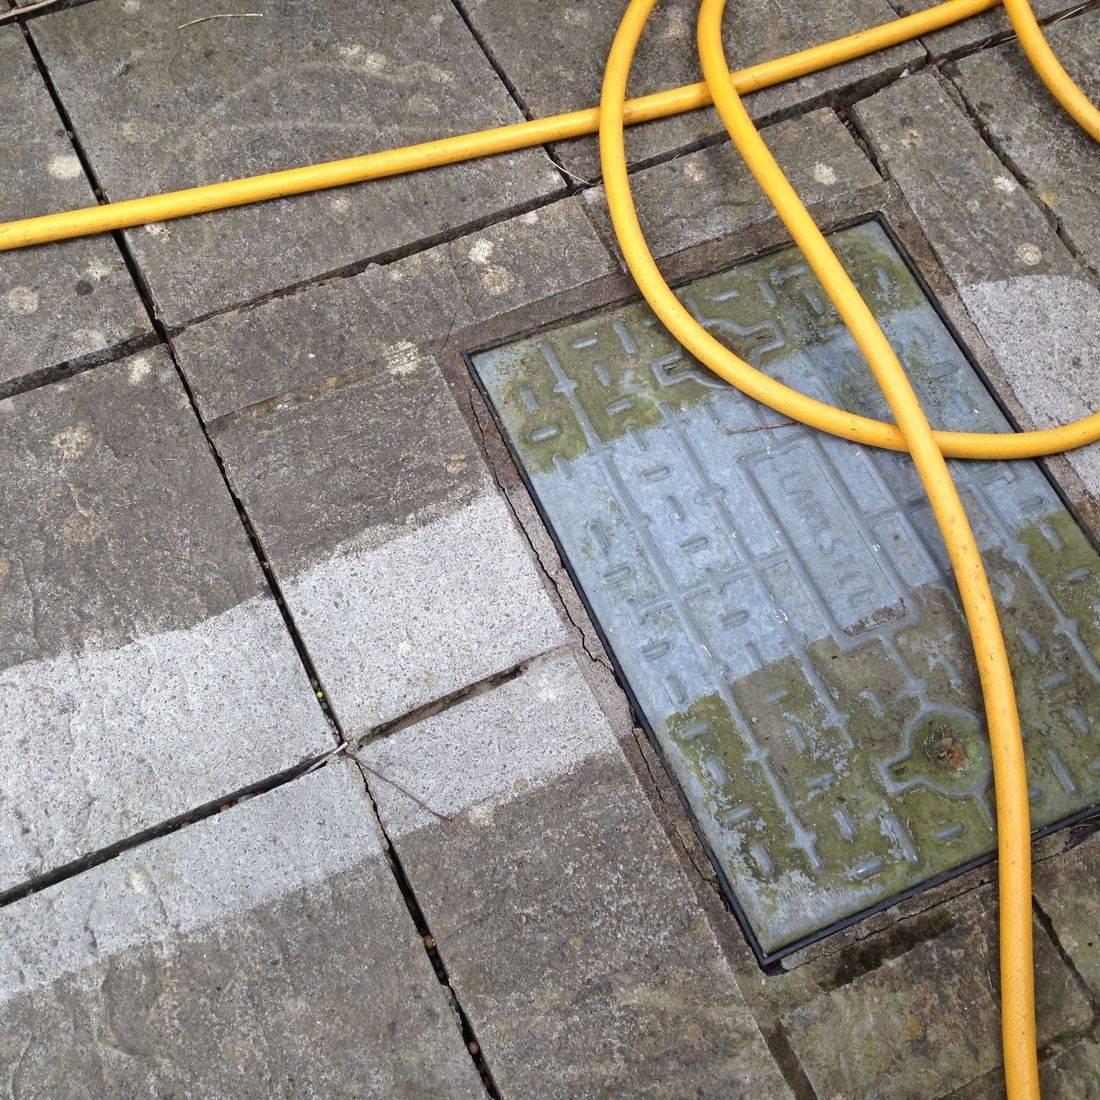 drain green algae muke muk fill hose pipe